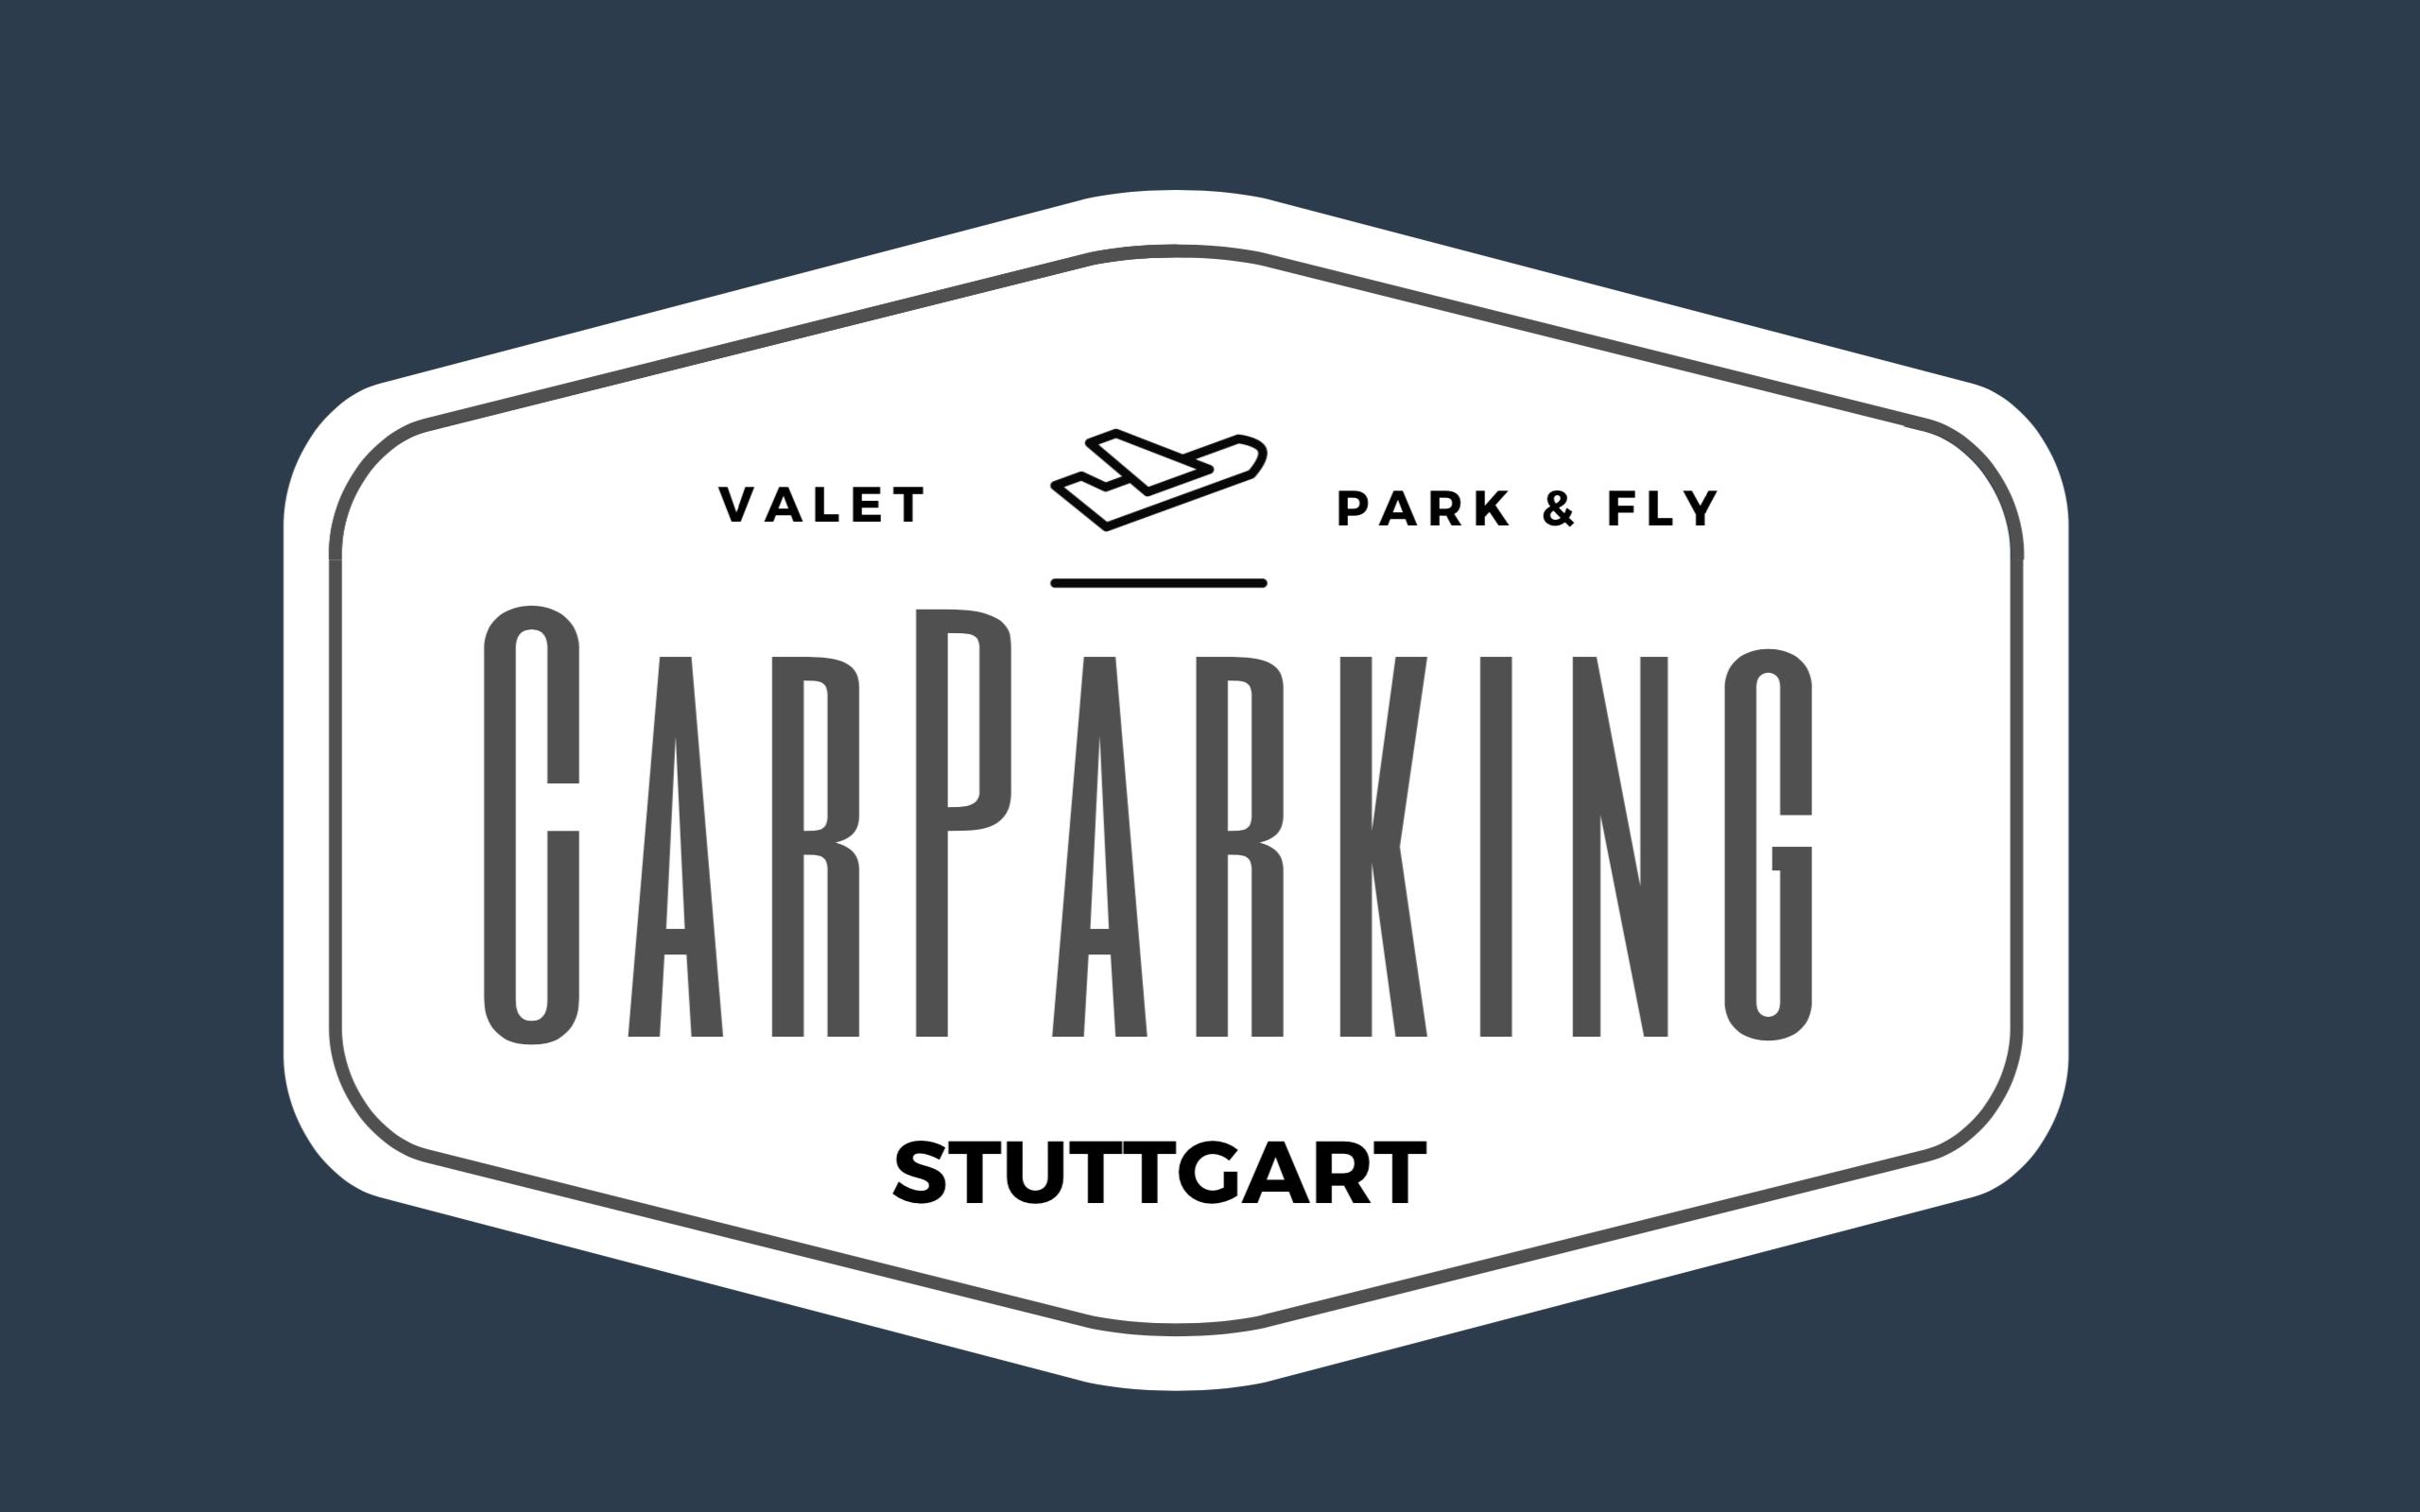 CarParking Stuttgart